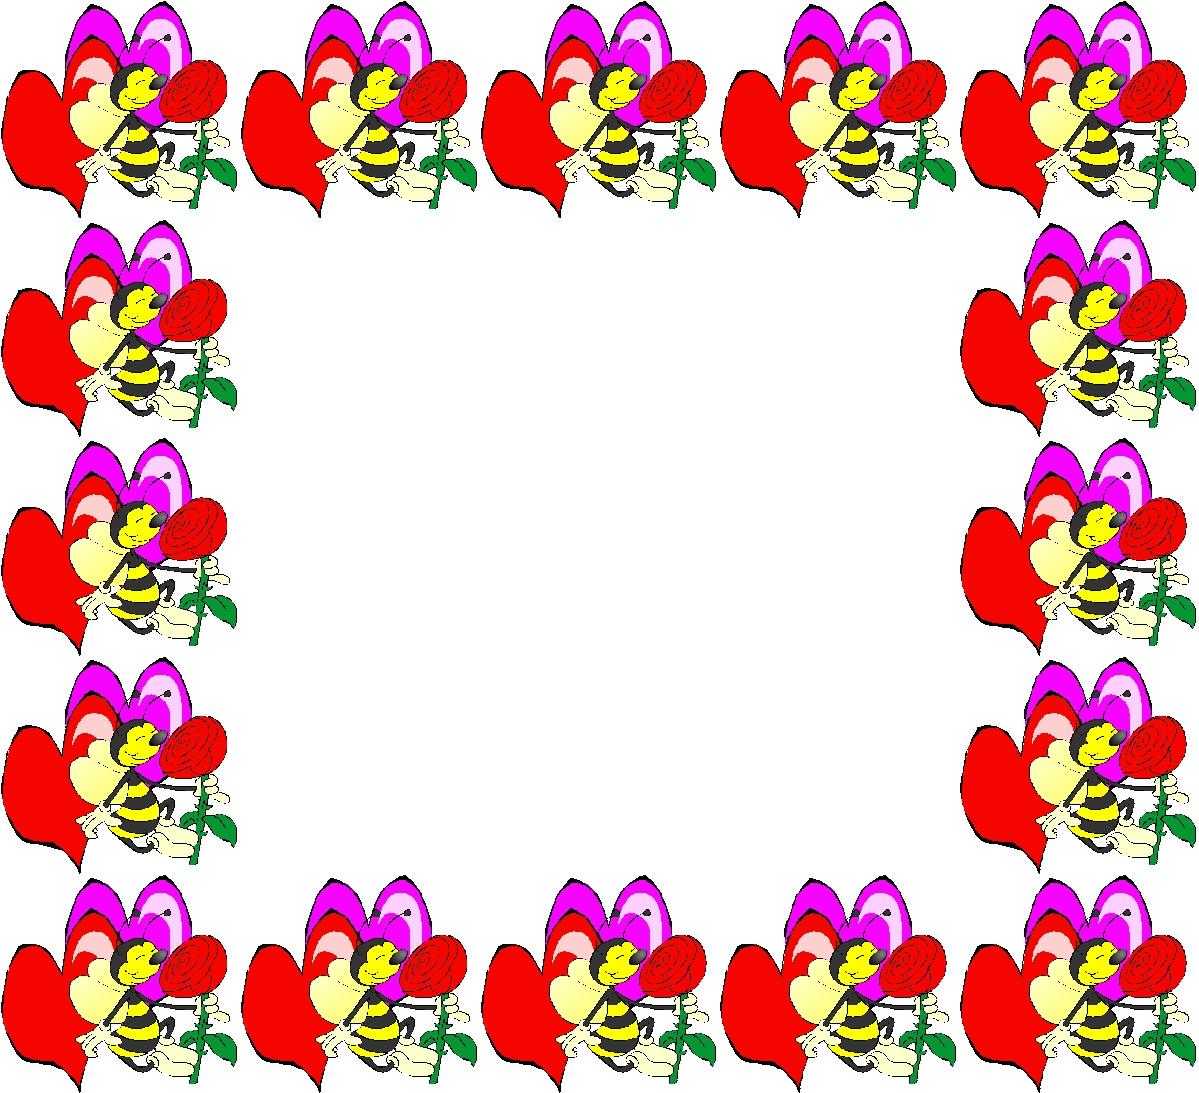 Bugs clipart february Art Clipart turkey%20border%20clip%20art Turkey Border